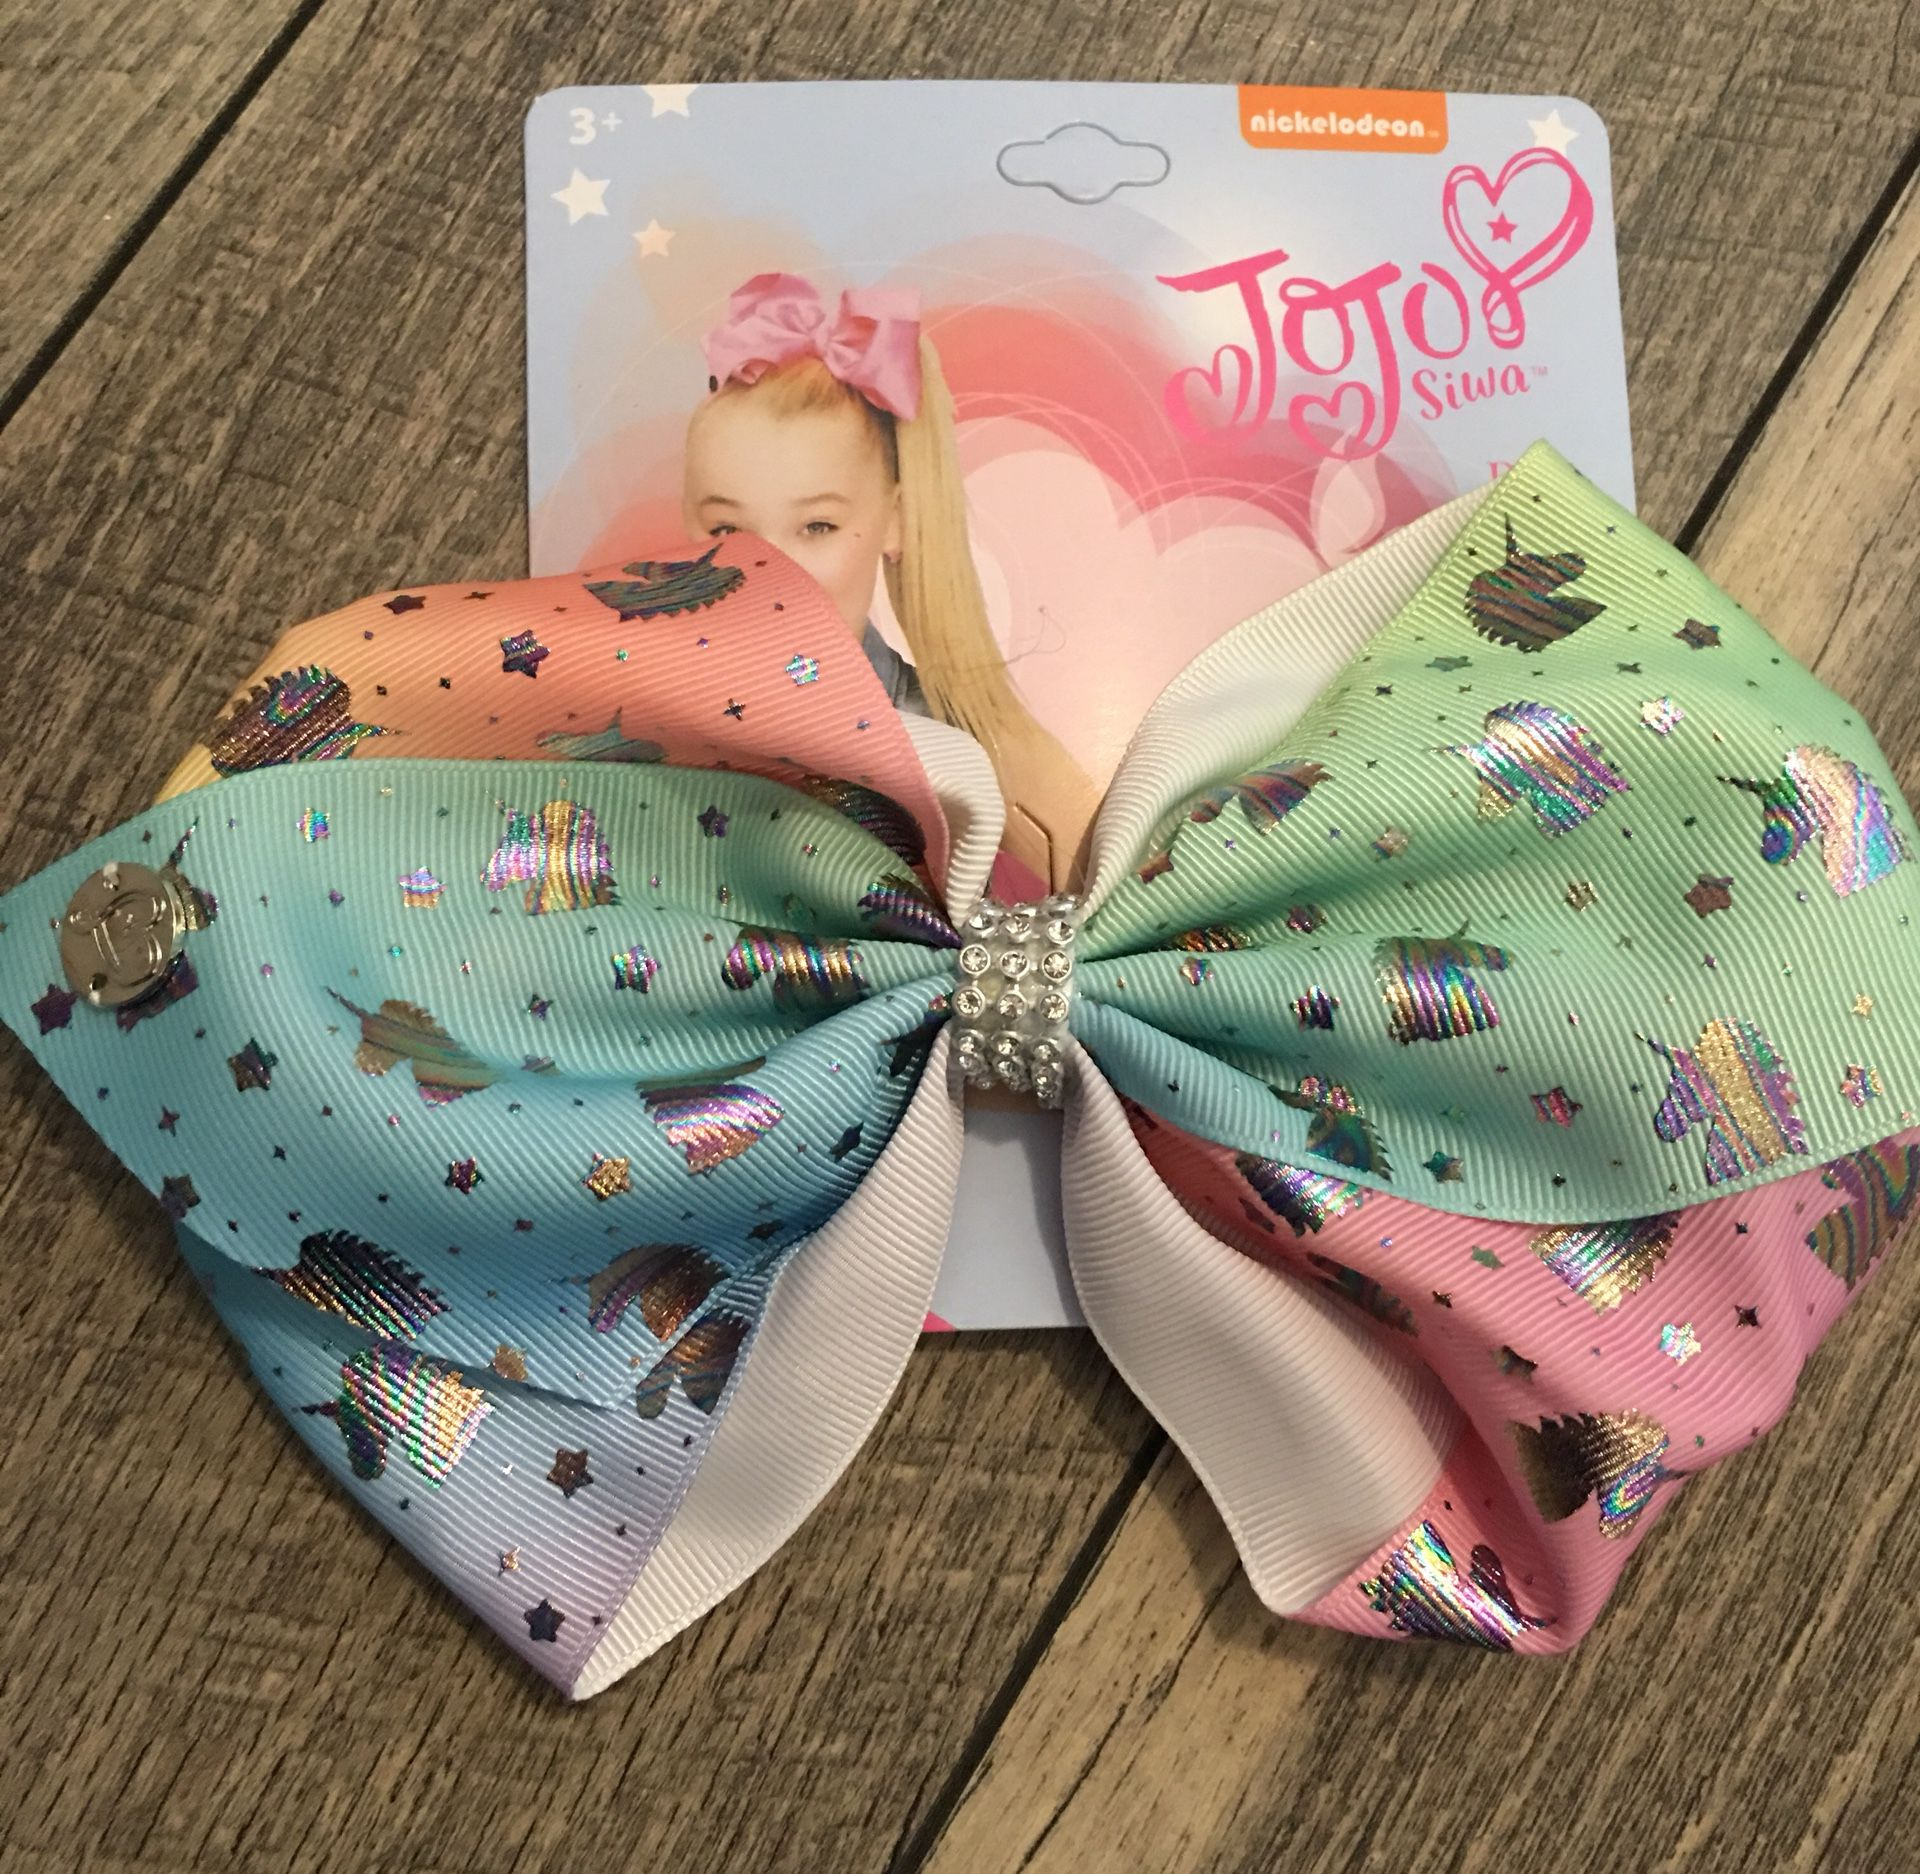 Jojo bows!!! New unicorn jojo bows